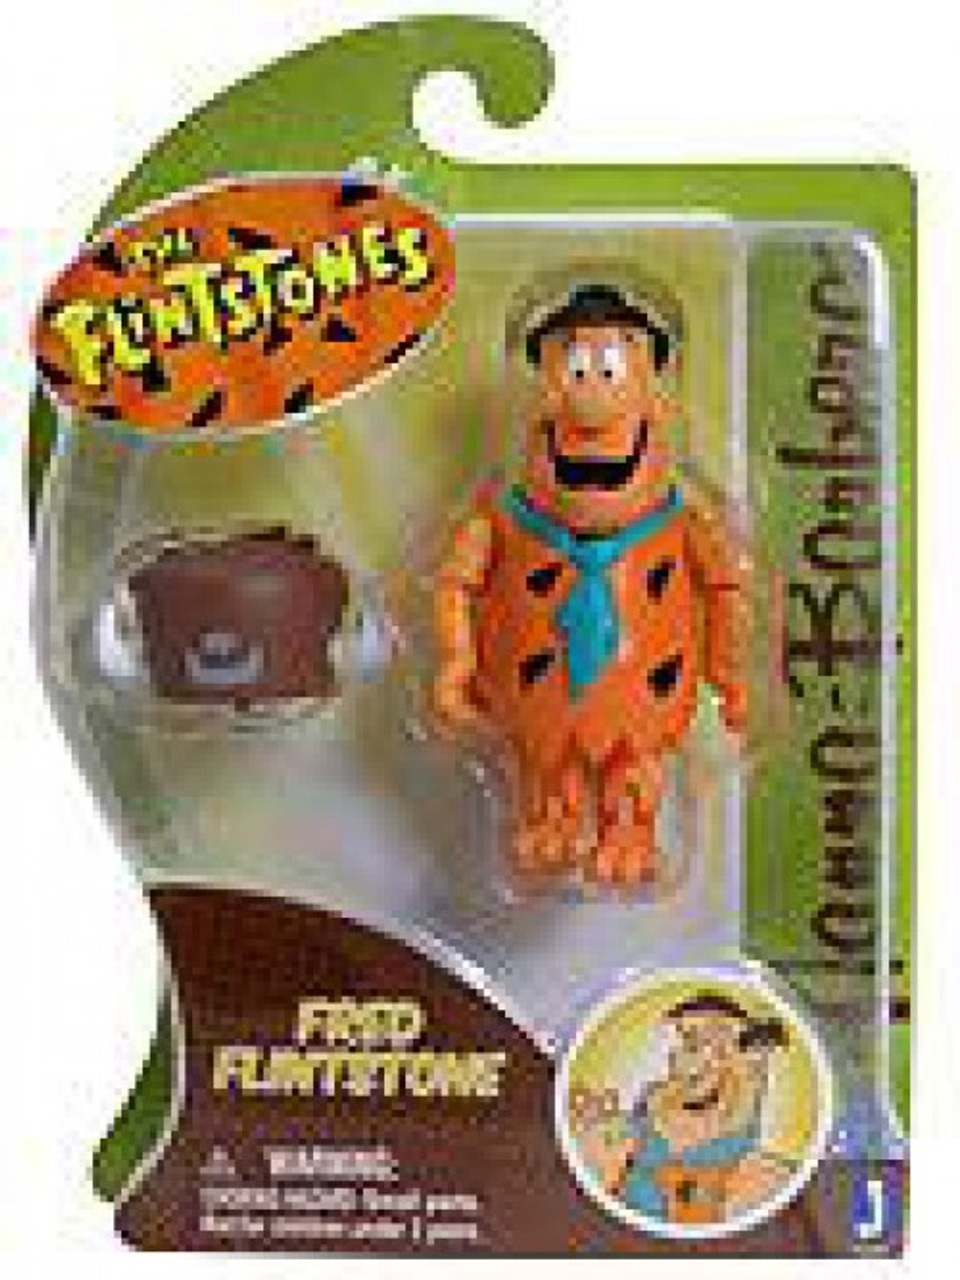 Captain Caveman Talking 12 Inch Plush Doll Toy By Jazwares Hanna-Barbera NEW